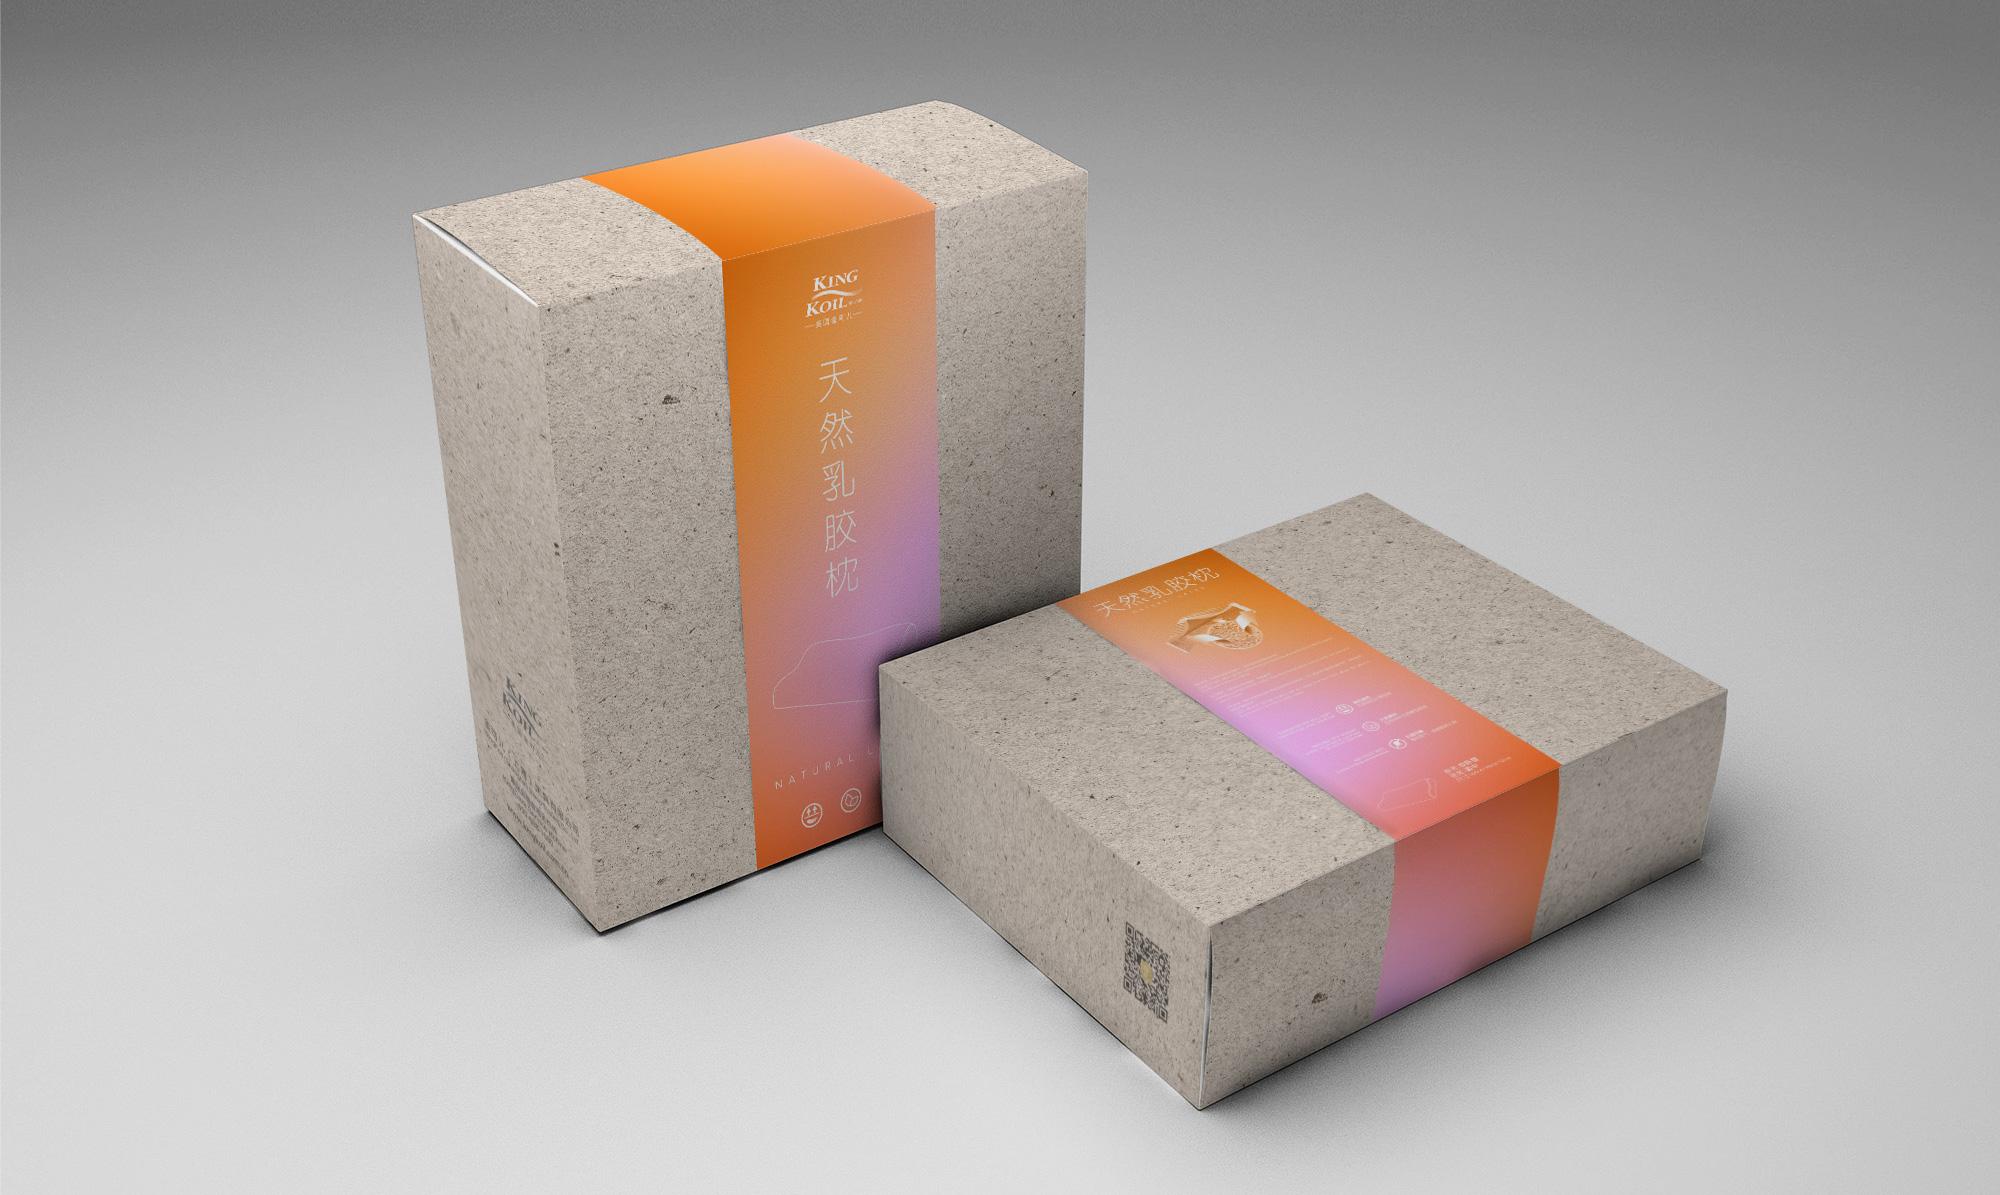 quentin_paquignon-packaging-kingkoilchina_01.jpg